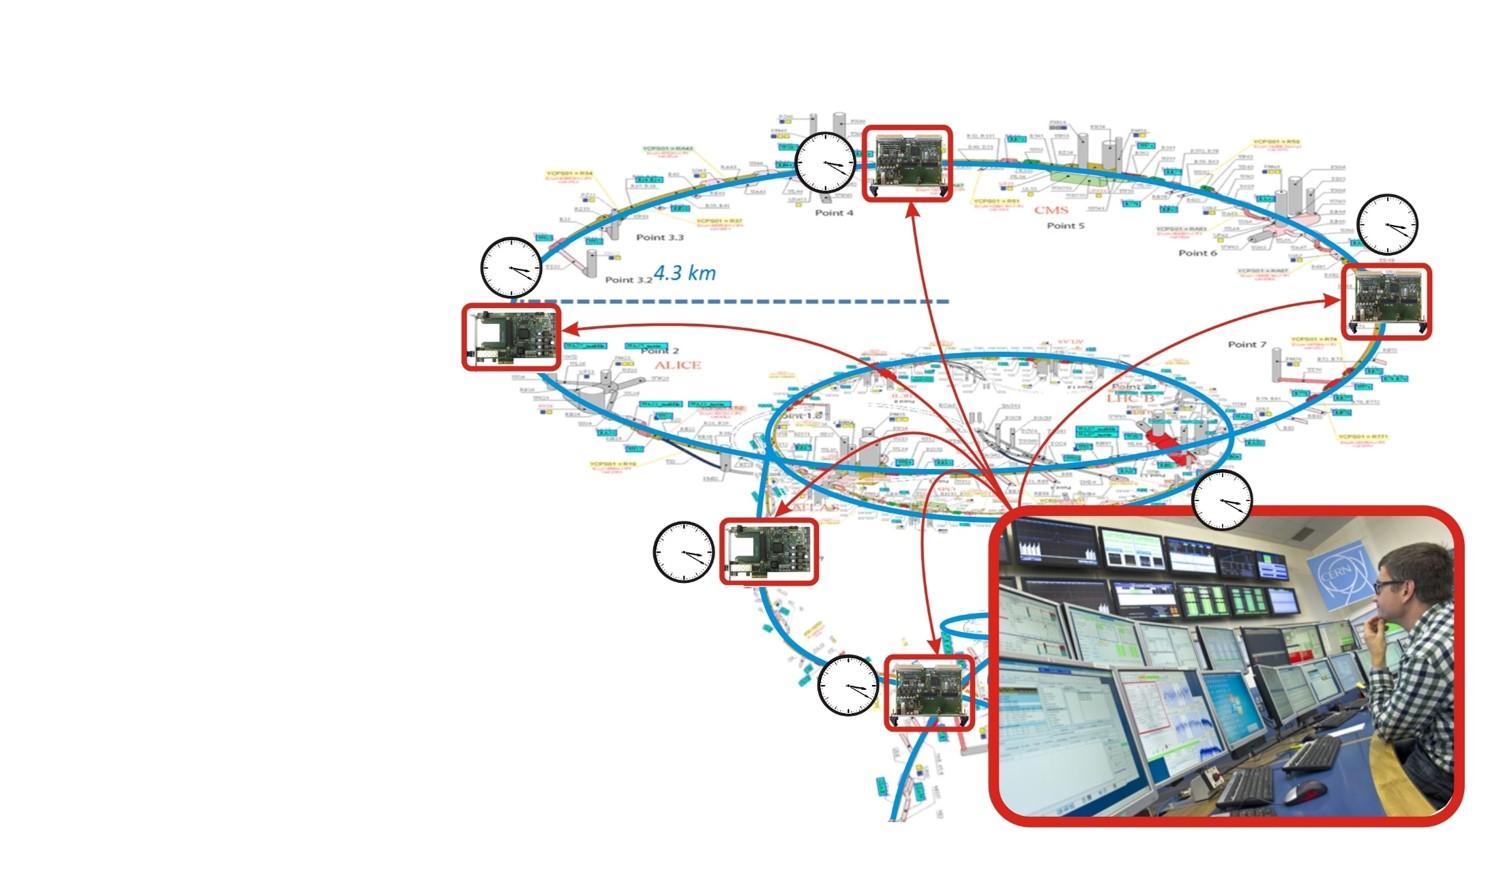 figures/applications/CERN/Determinism+synchronization-1.jpg